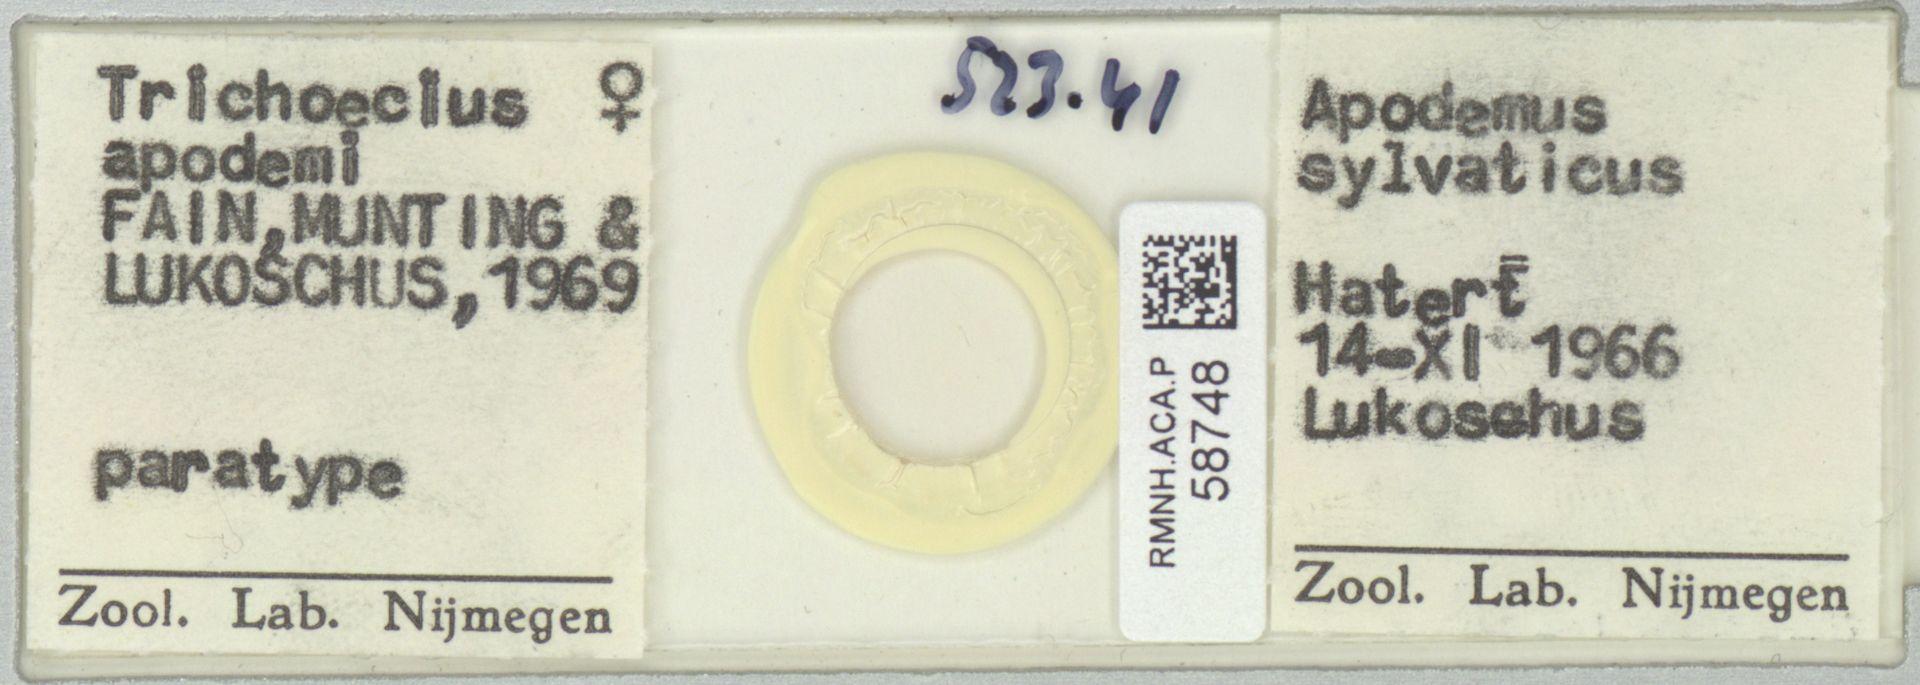 RMNH.ACA.P.58748   Trichoecius apodemi Fain, Munting & Lukoschus 1969